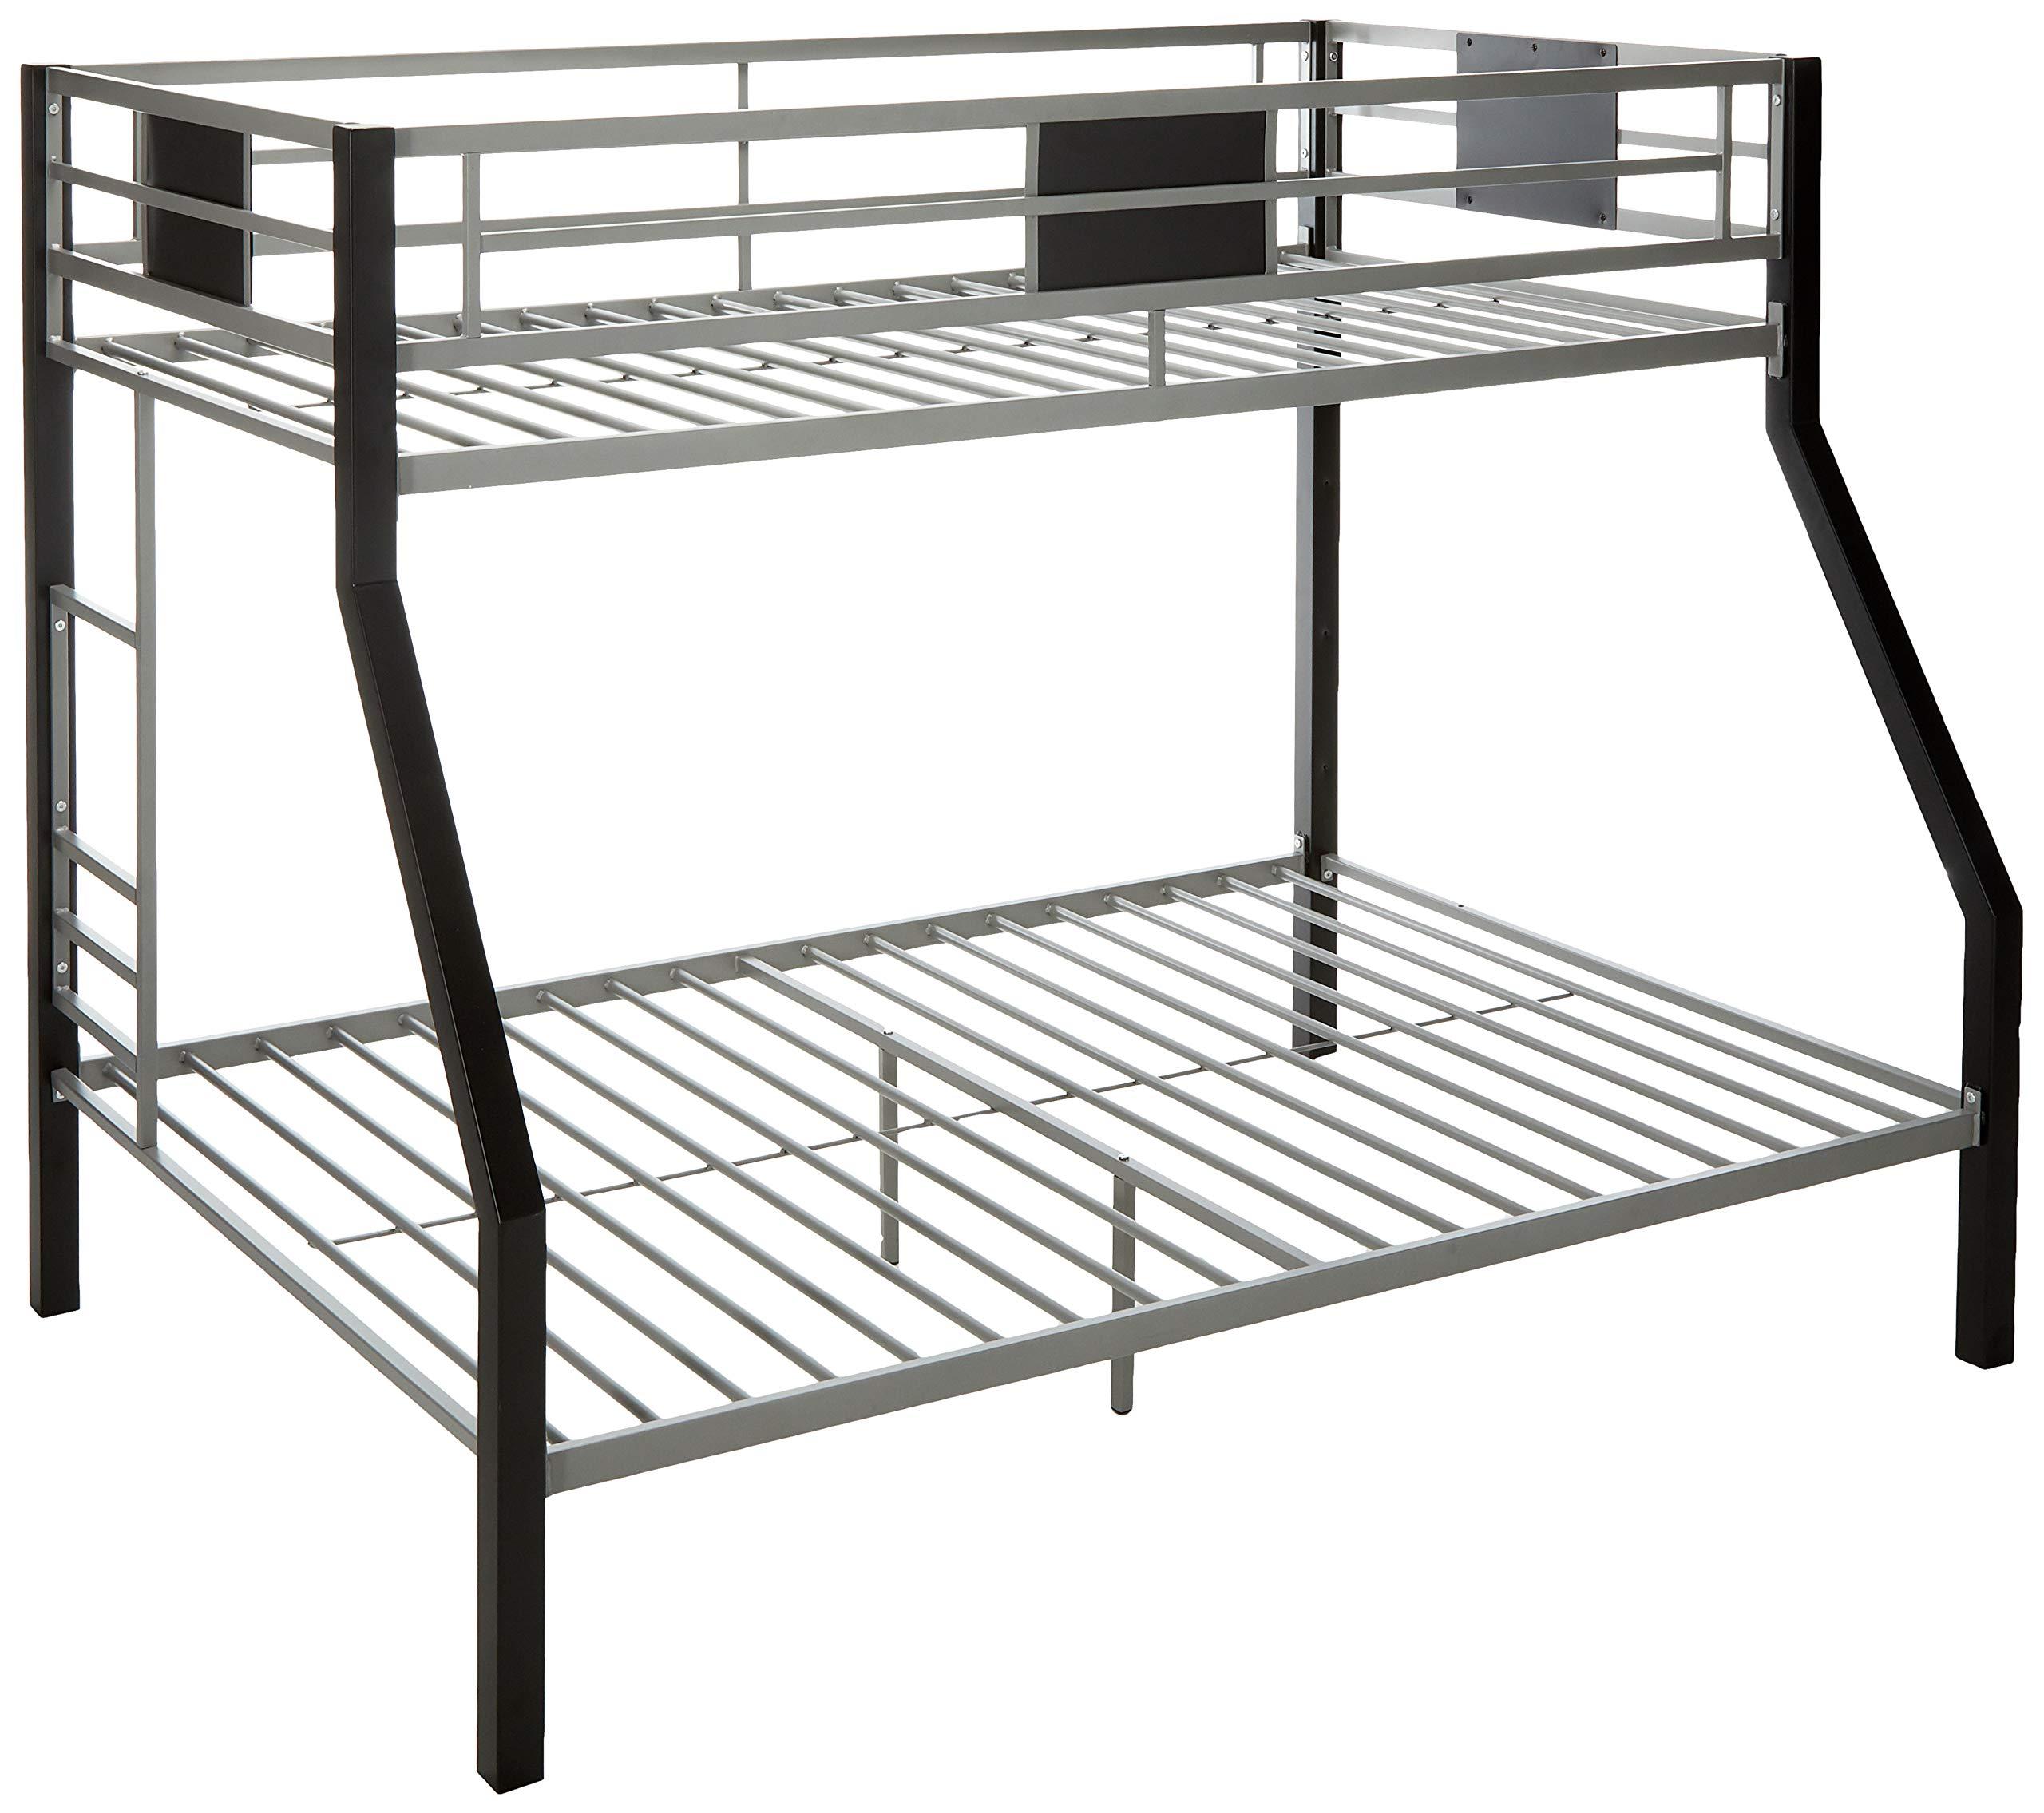 Ashley Furniture Signature Design - Dinsmore Bunk Bed -Twin/Full -  Component Piece - Contemporary - Black/Gray